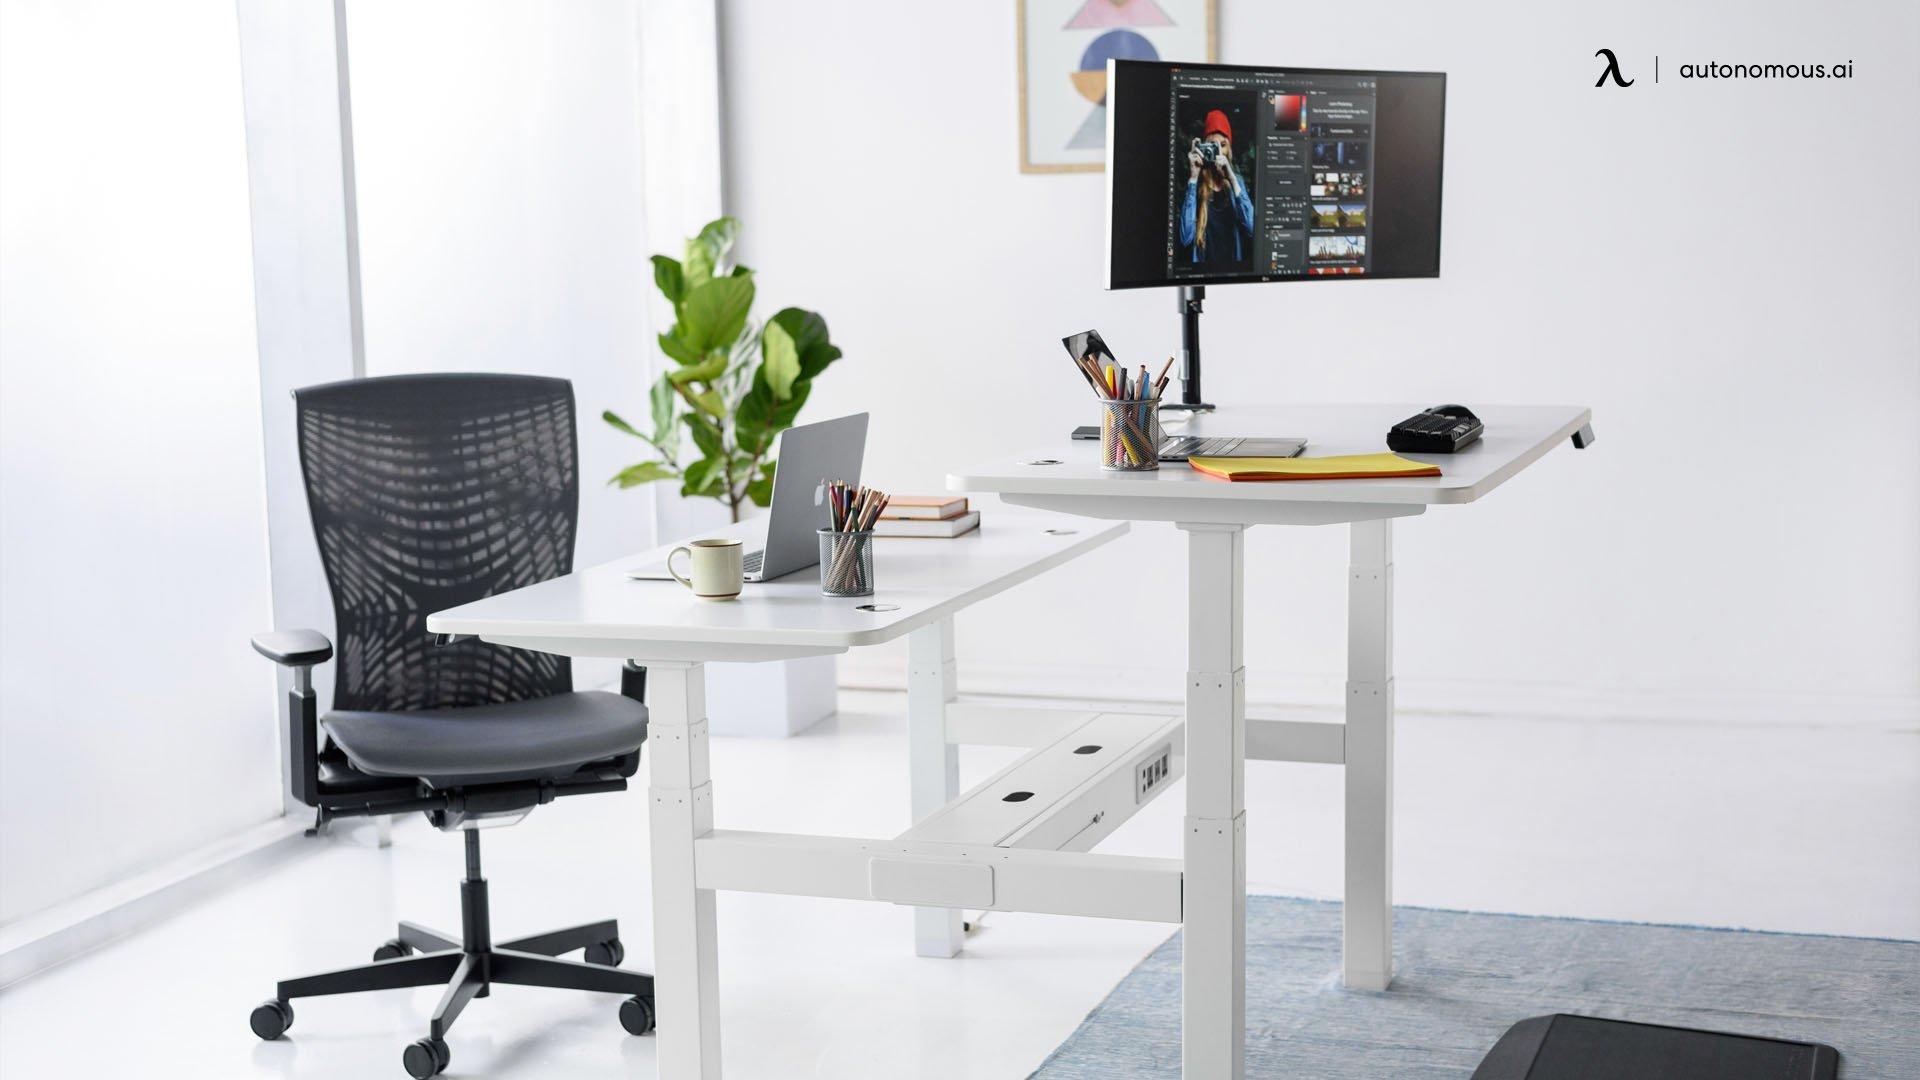 Ergonomic chair and smart desk